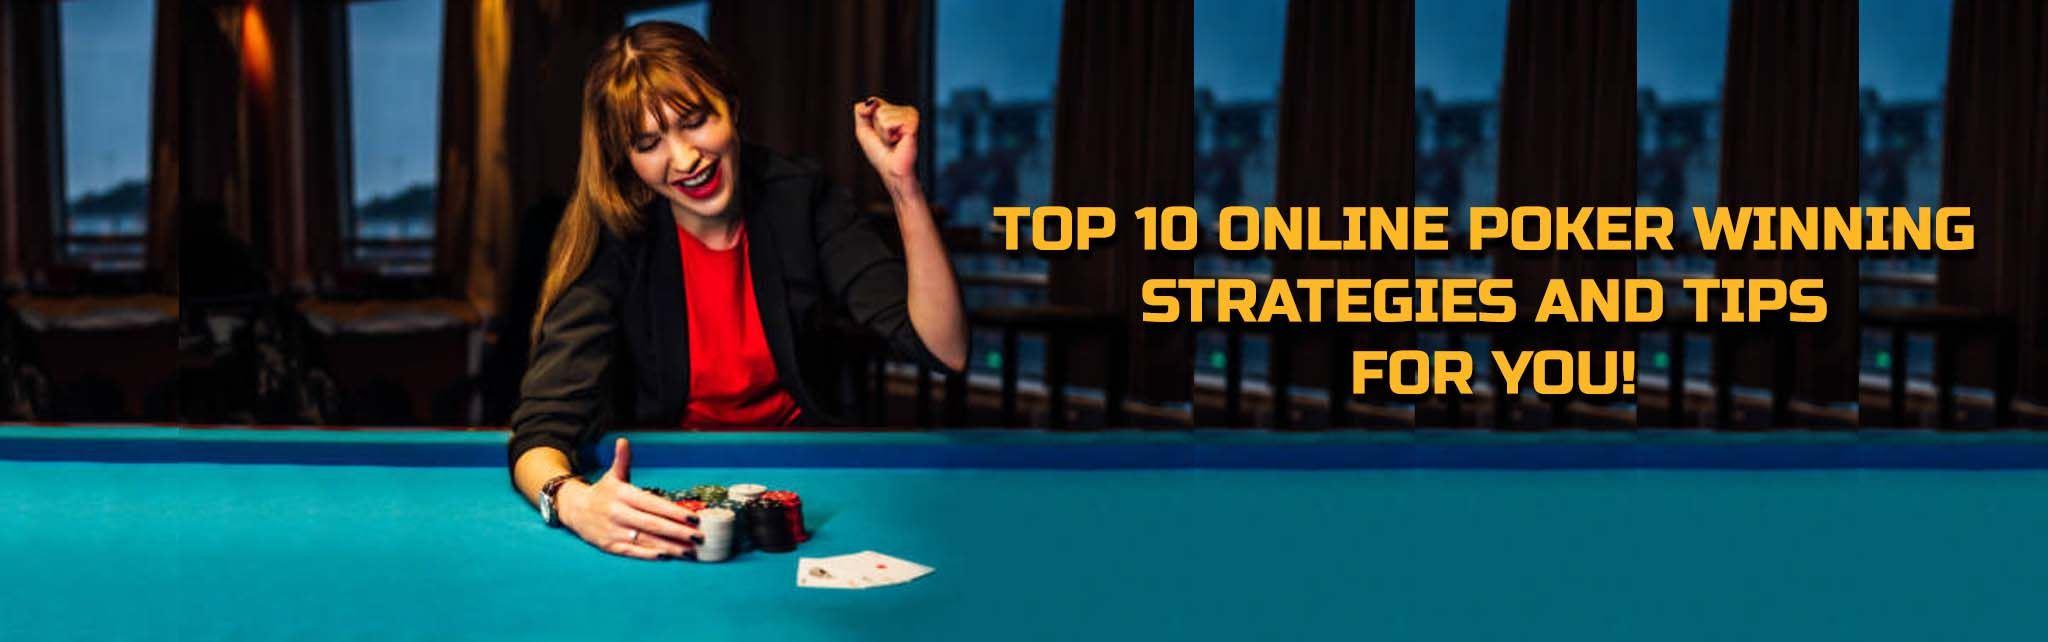 Online Poker Winning Strategies